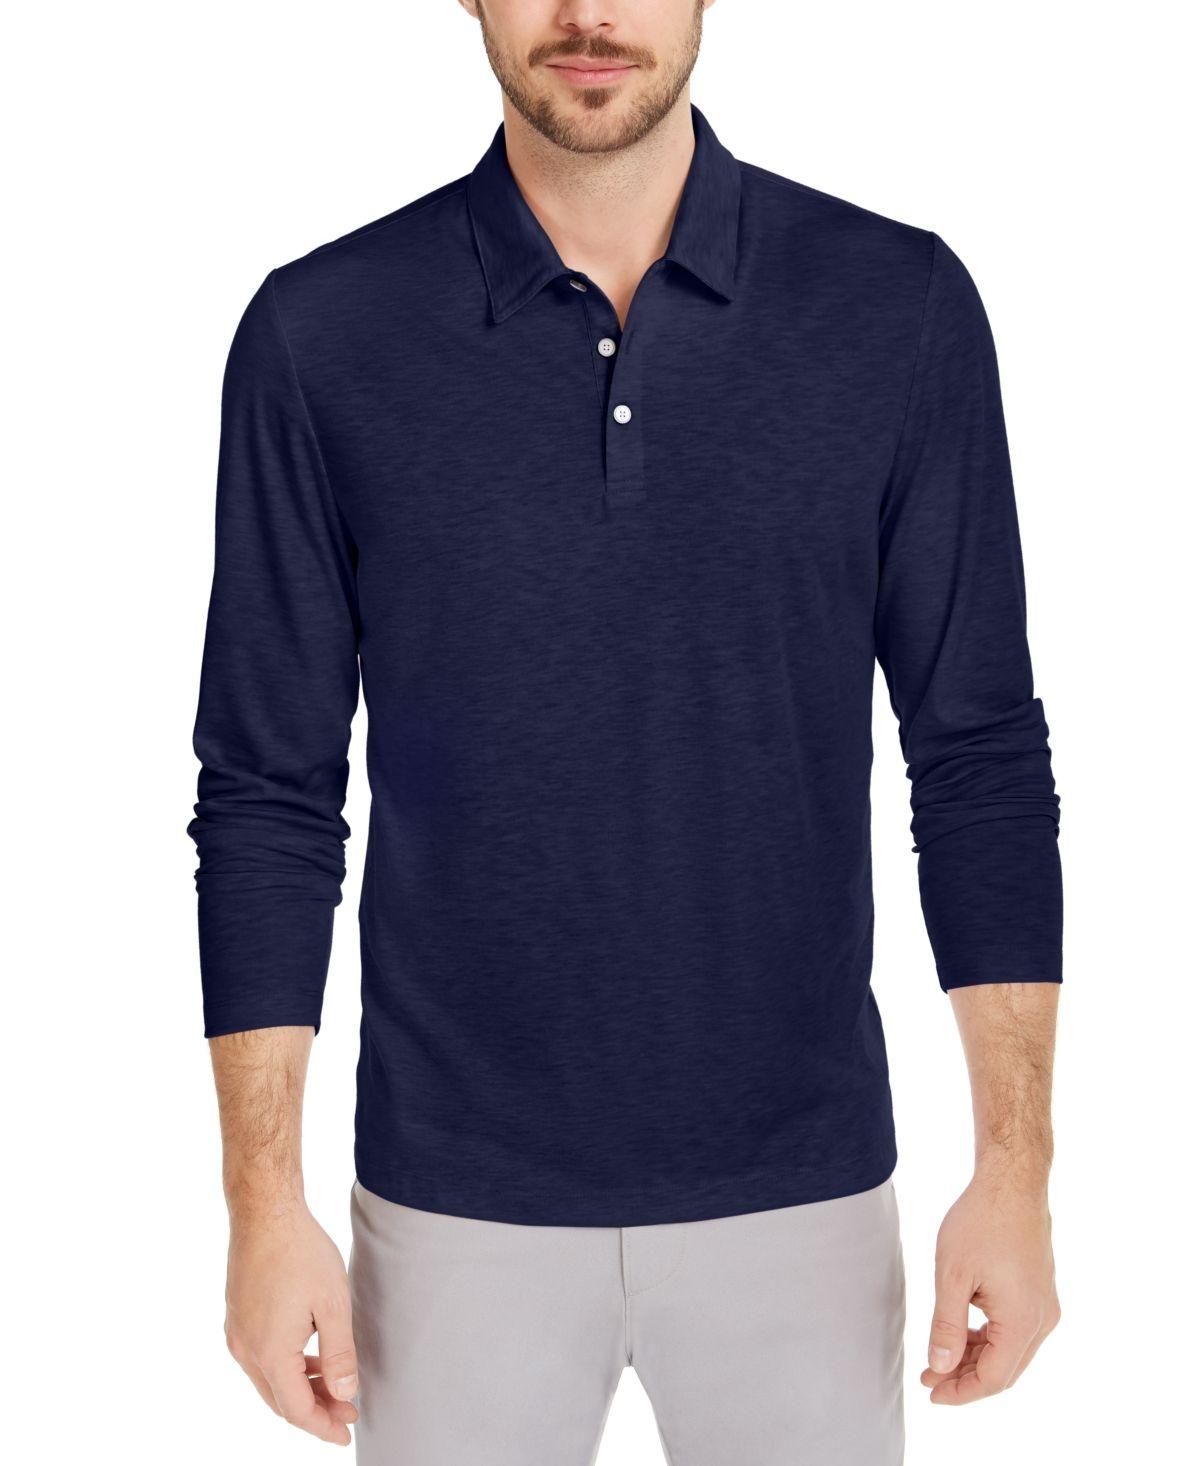 , Alfani Men's AlfaTech Stretch Solid Long Sleeve Polo Shirt, Created for Macy's & Reviews – Polos – Men – Macy's, Hot Models Blog 2020, Hot Models Blog 2020